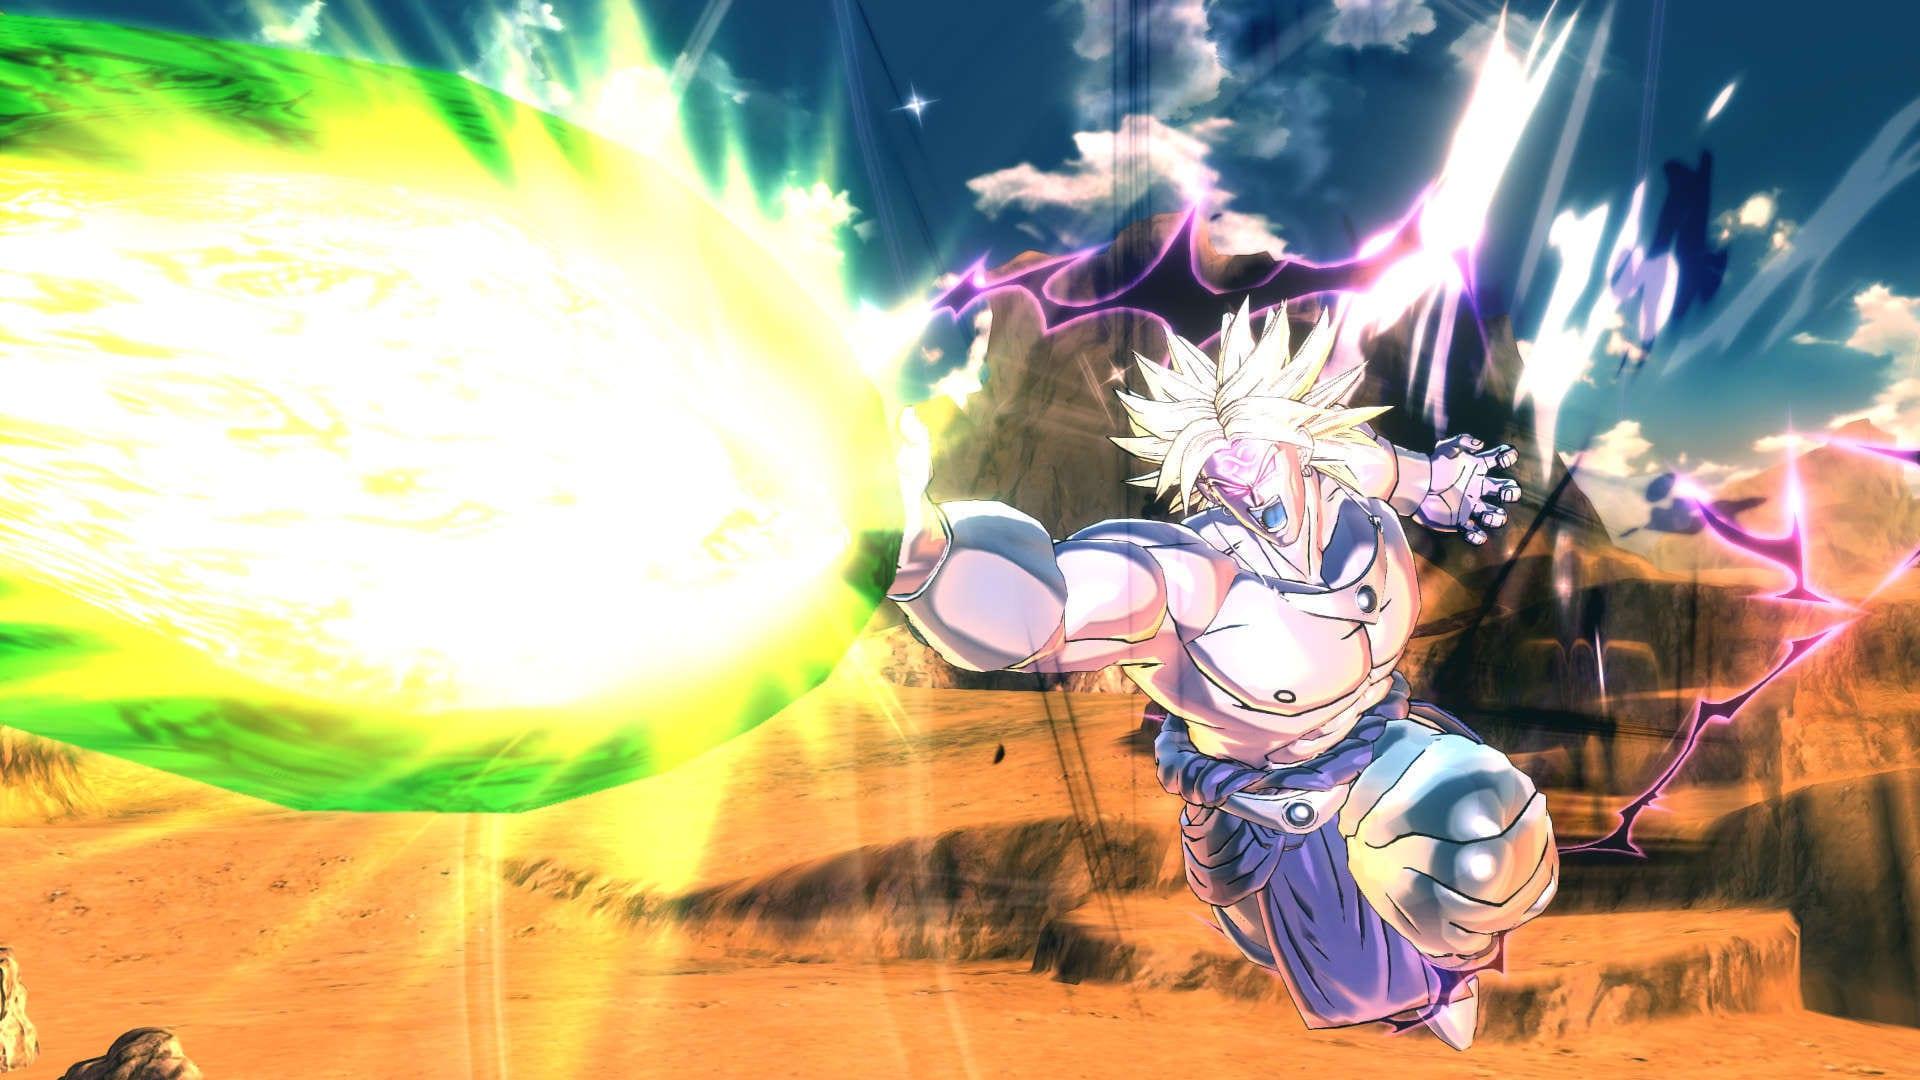 Dragon ball Xenoverse 2 Full crack